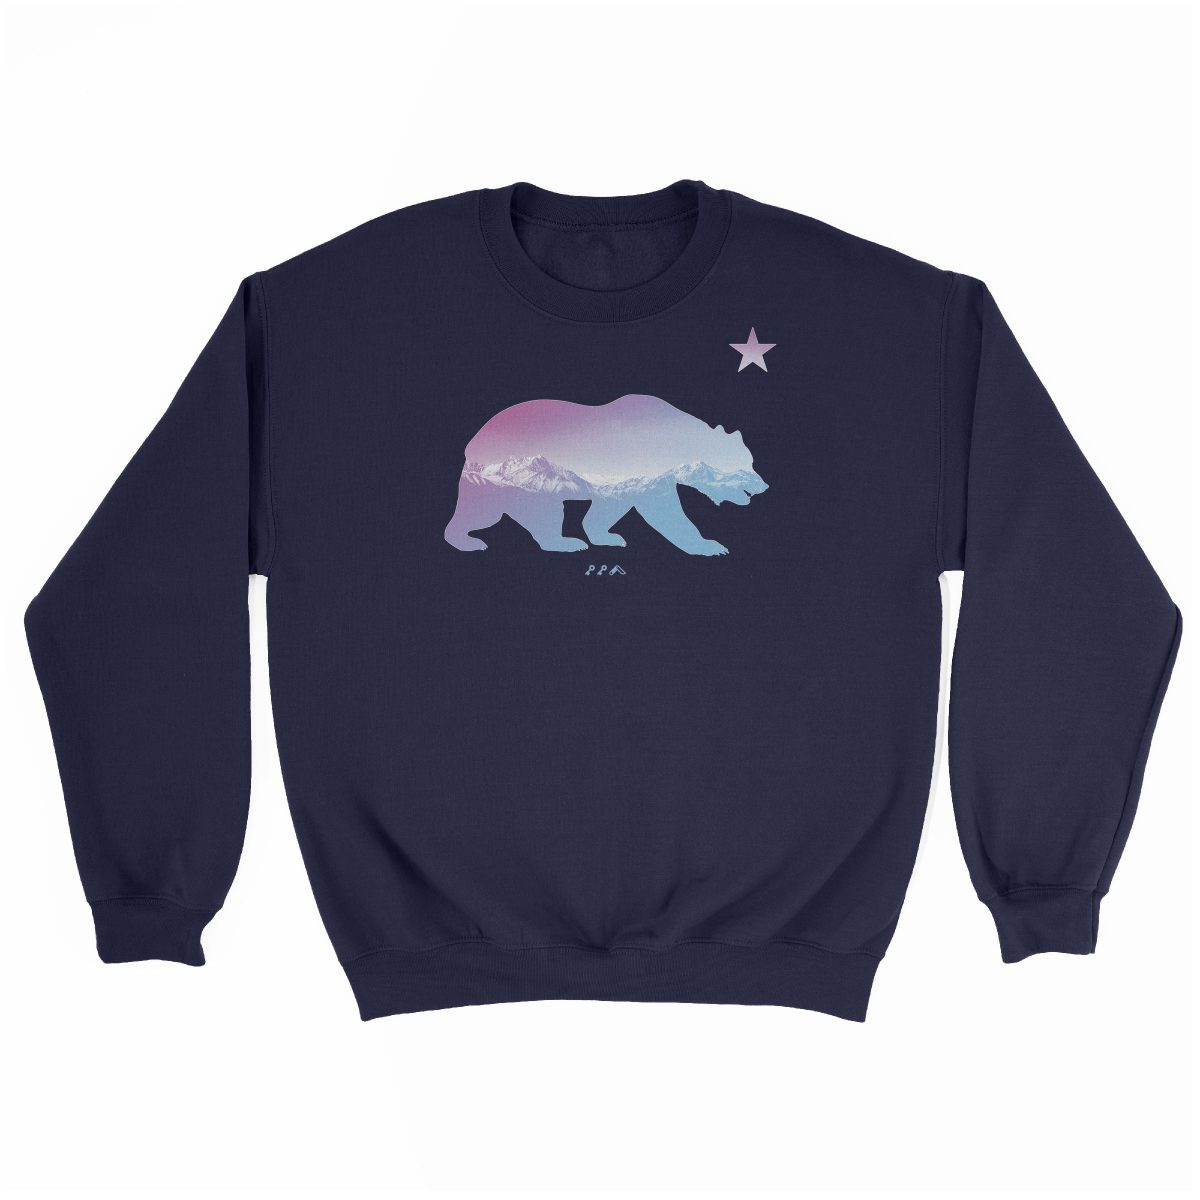 """BARE MOUNTAINS"" california bear sweatshirts in navy by kikicutt"